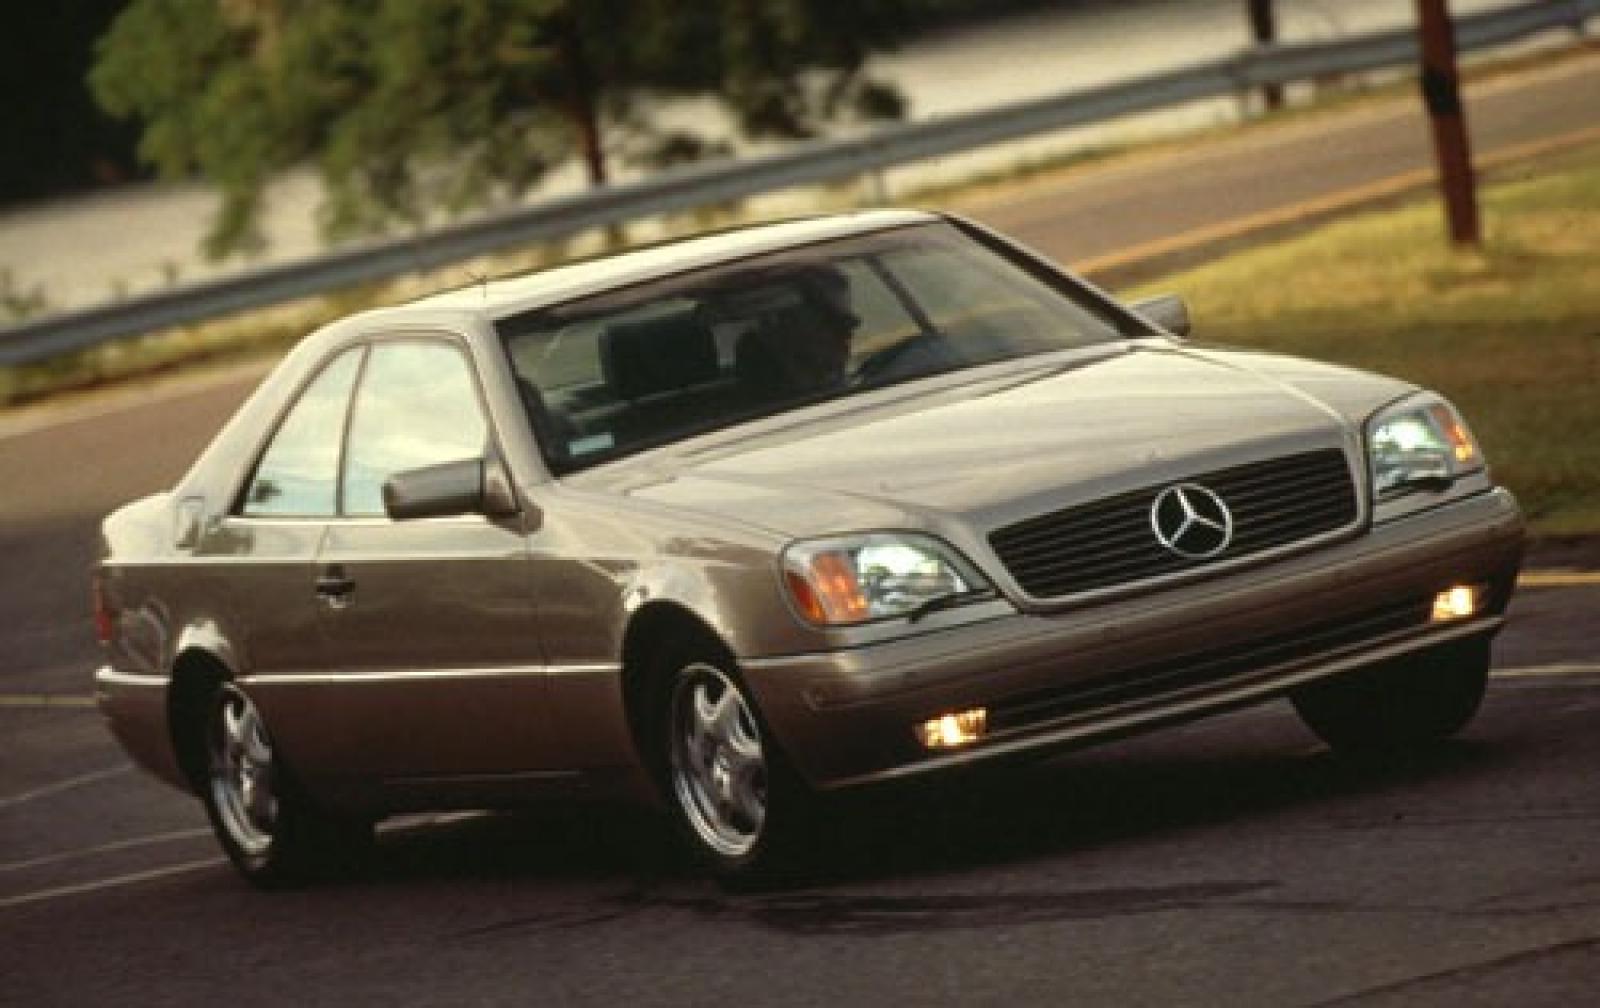 1998 mercedes benz cl class information and photos for Mercedes benz 1998